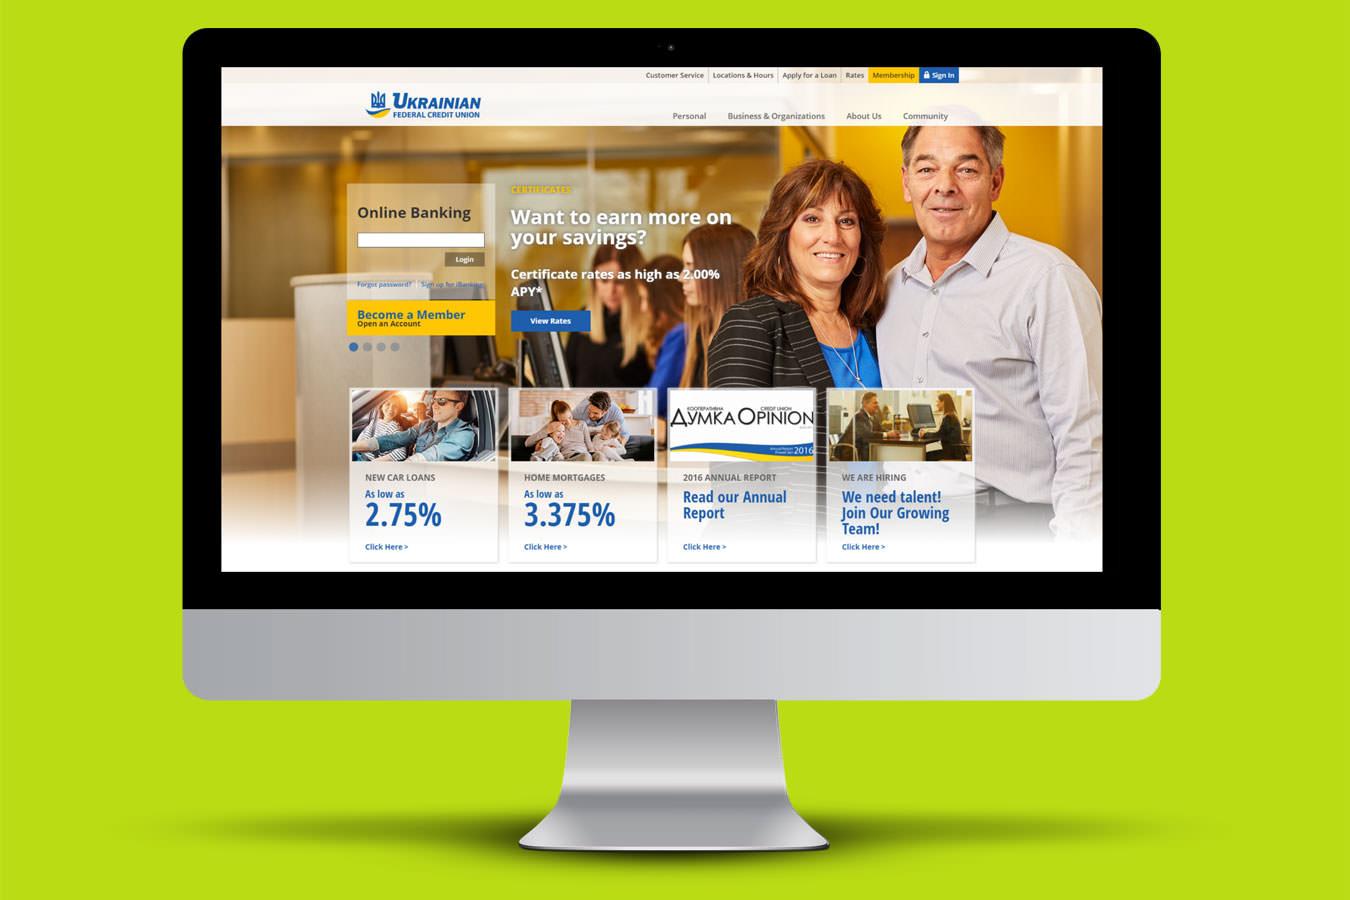 UFCU website homepage displayed on iMac